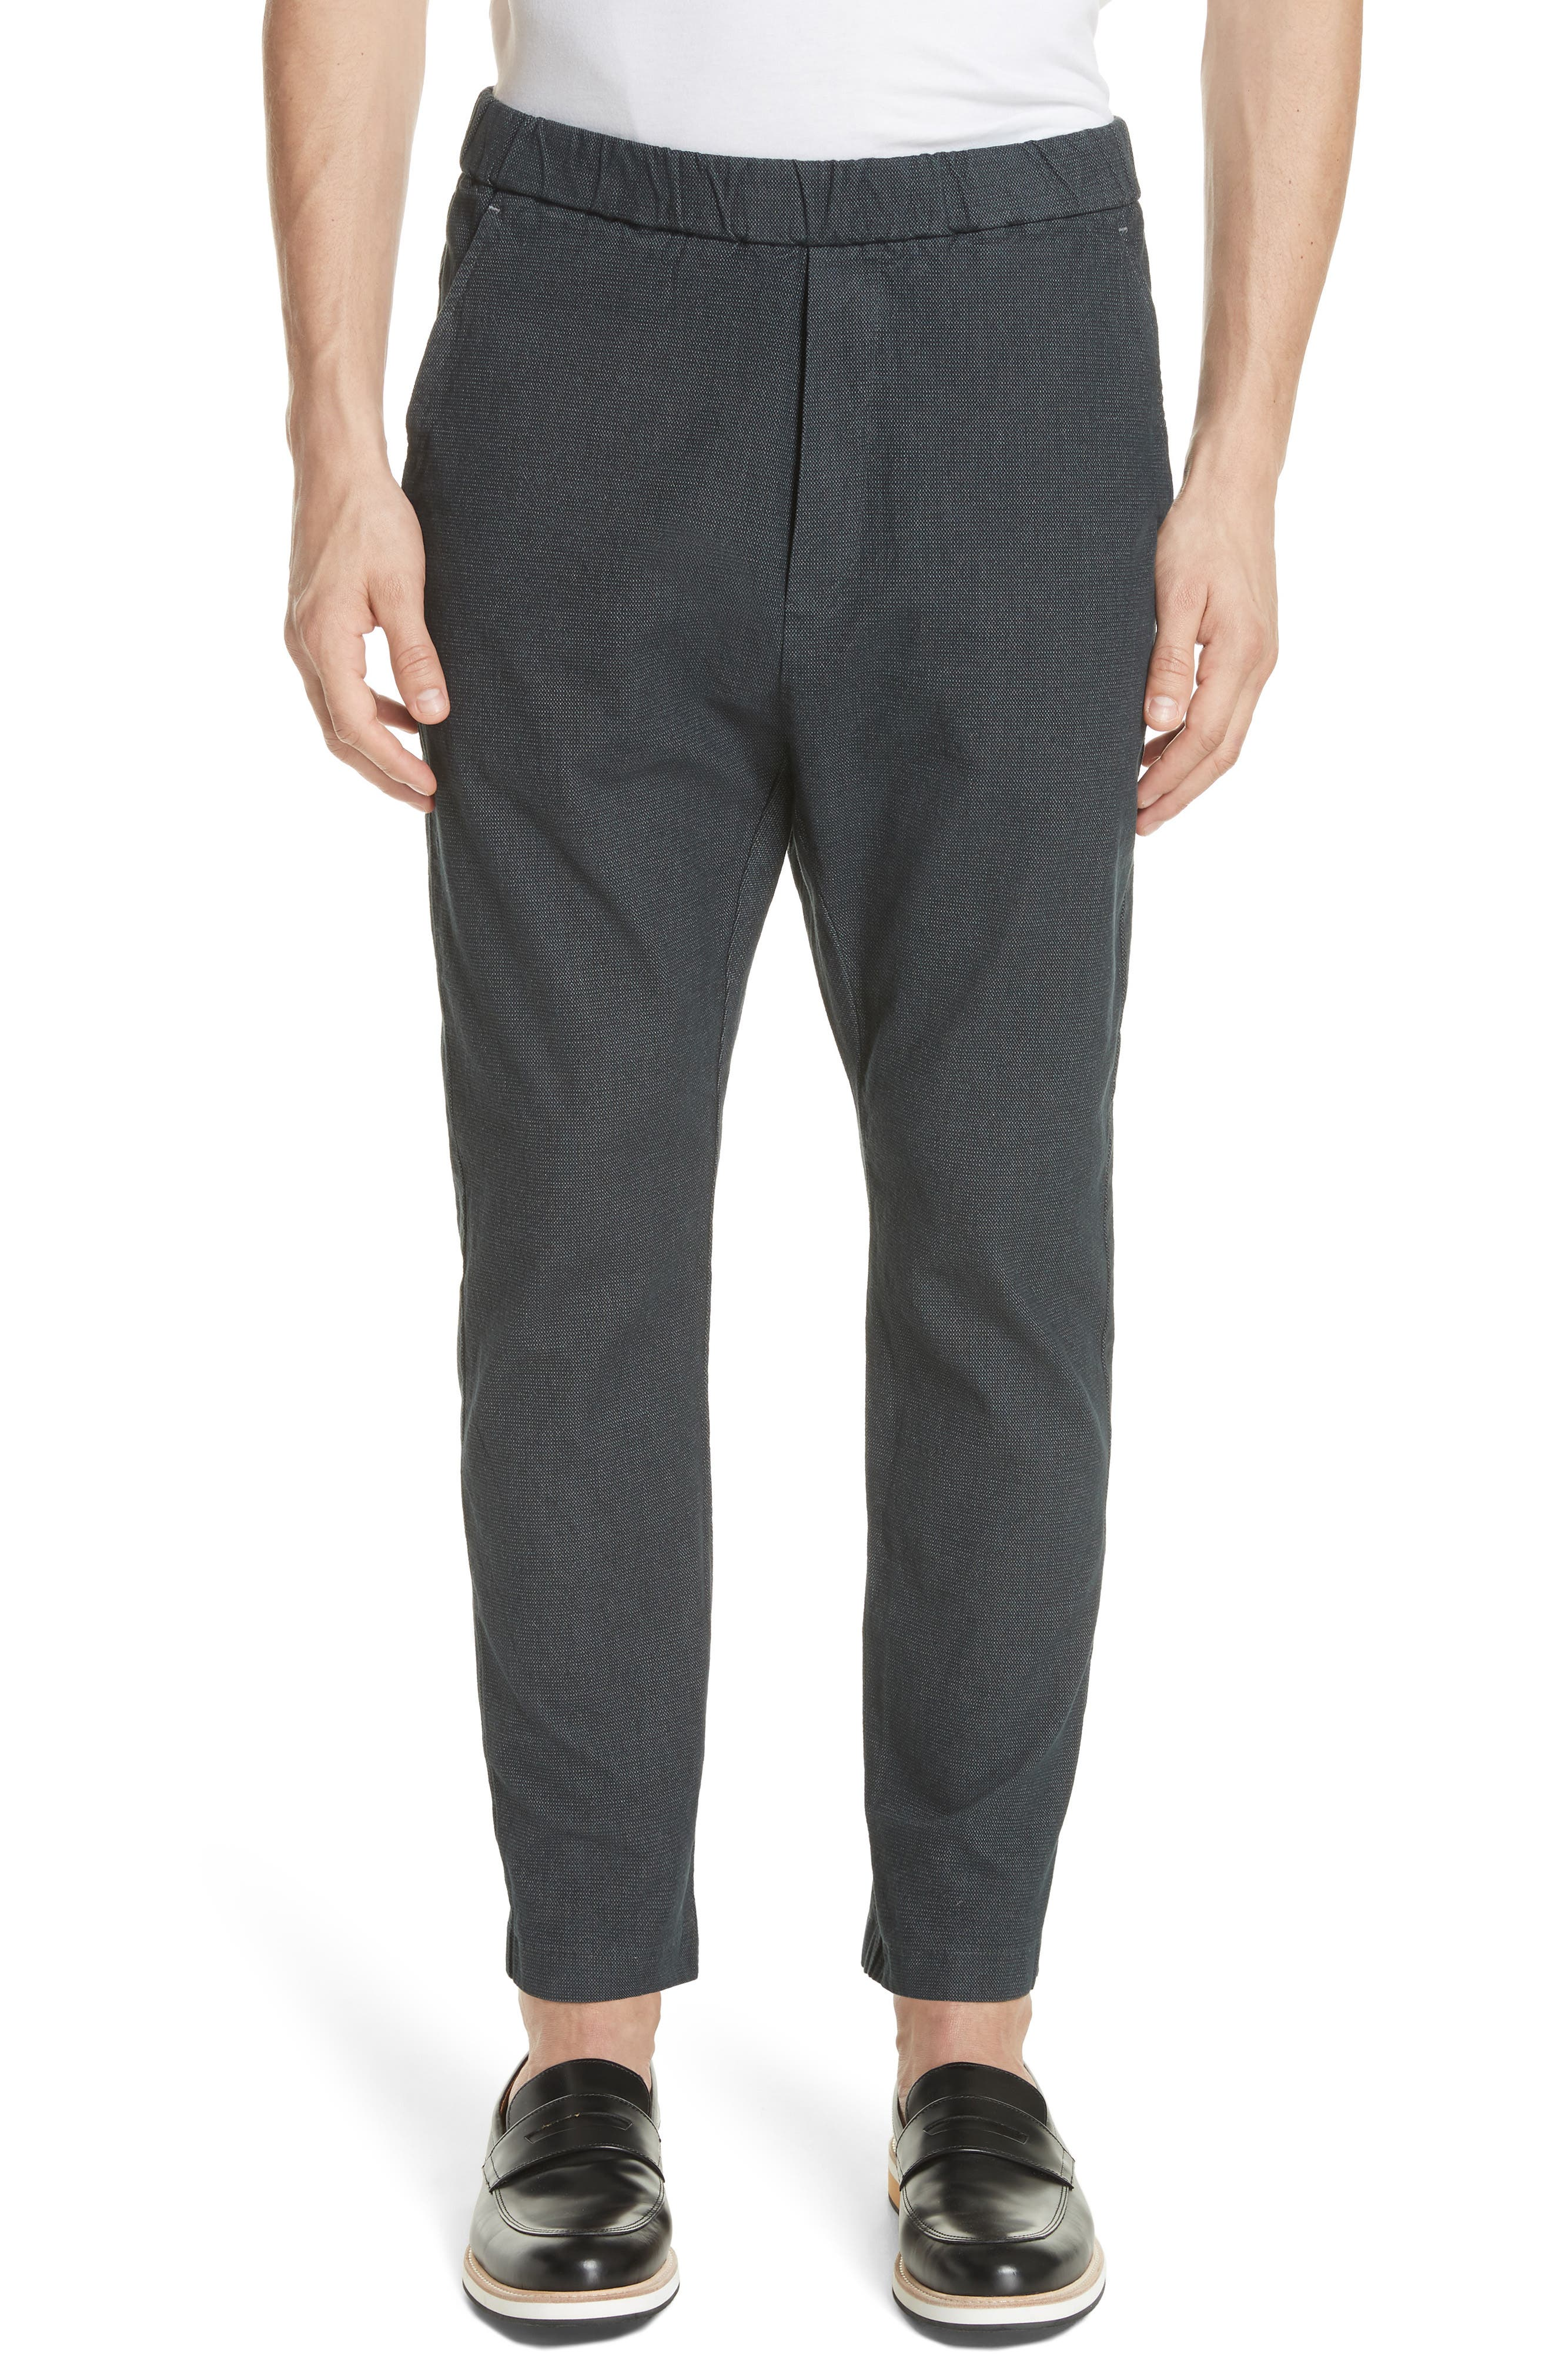 Aregna Ponto Trousers,                         Main,                         color, 020